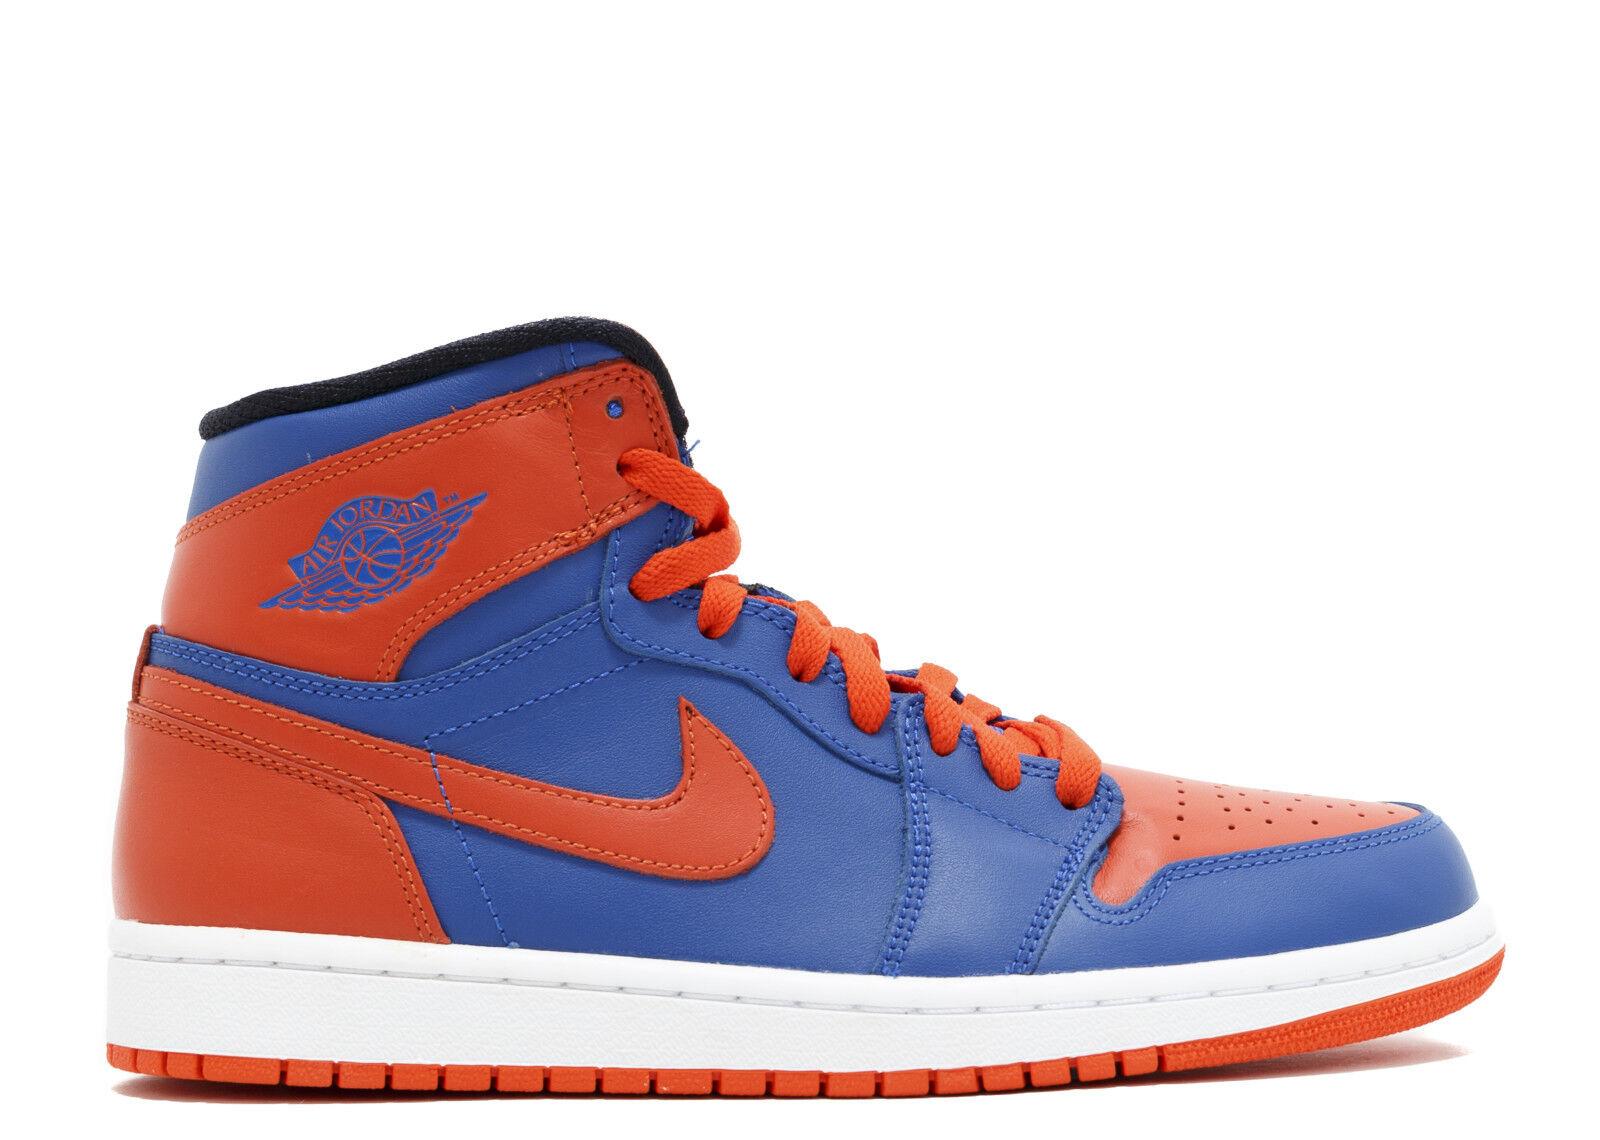 Nike Air Jordan 2013 1